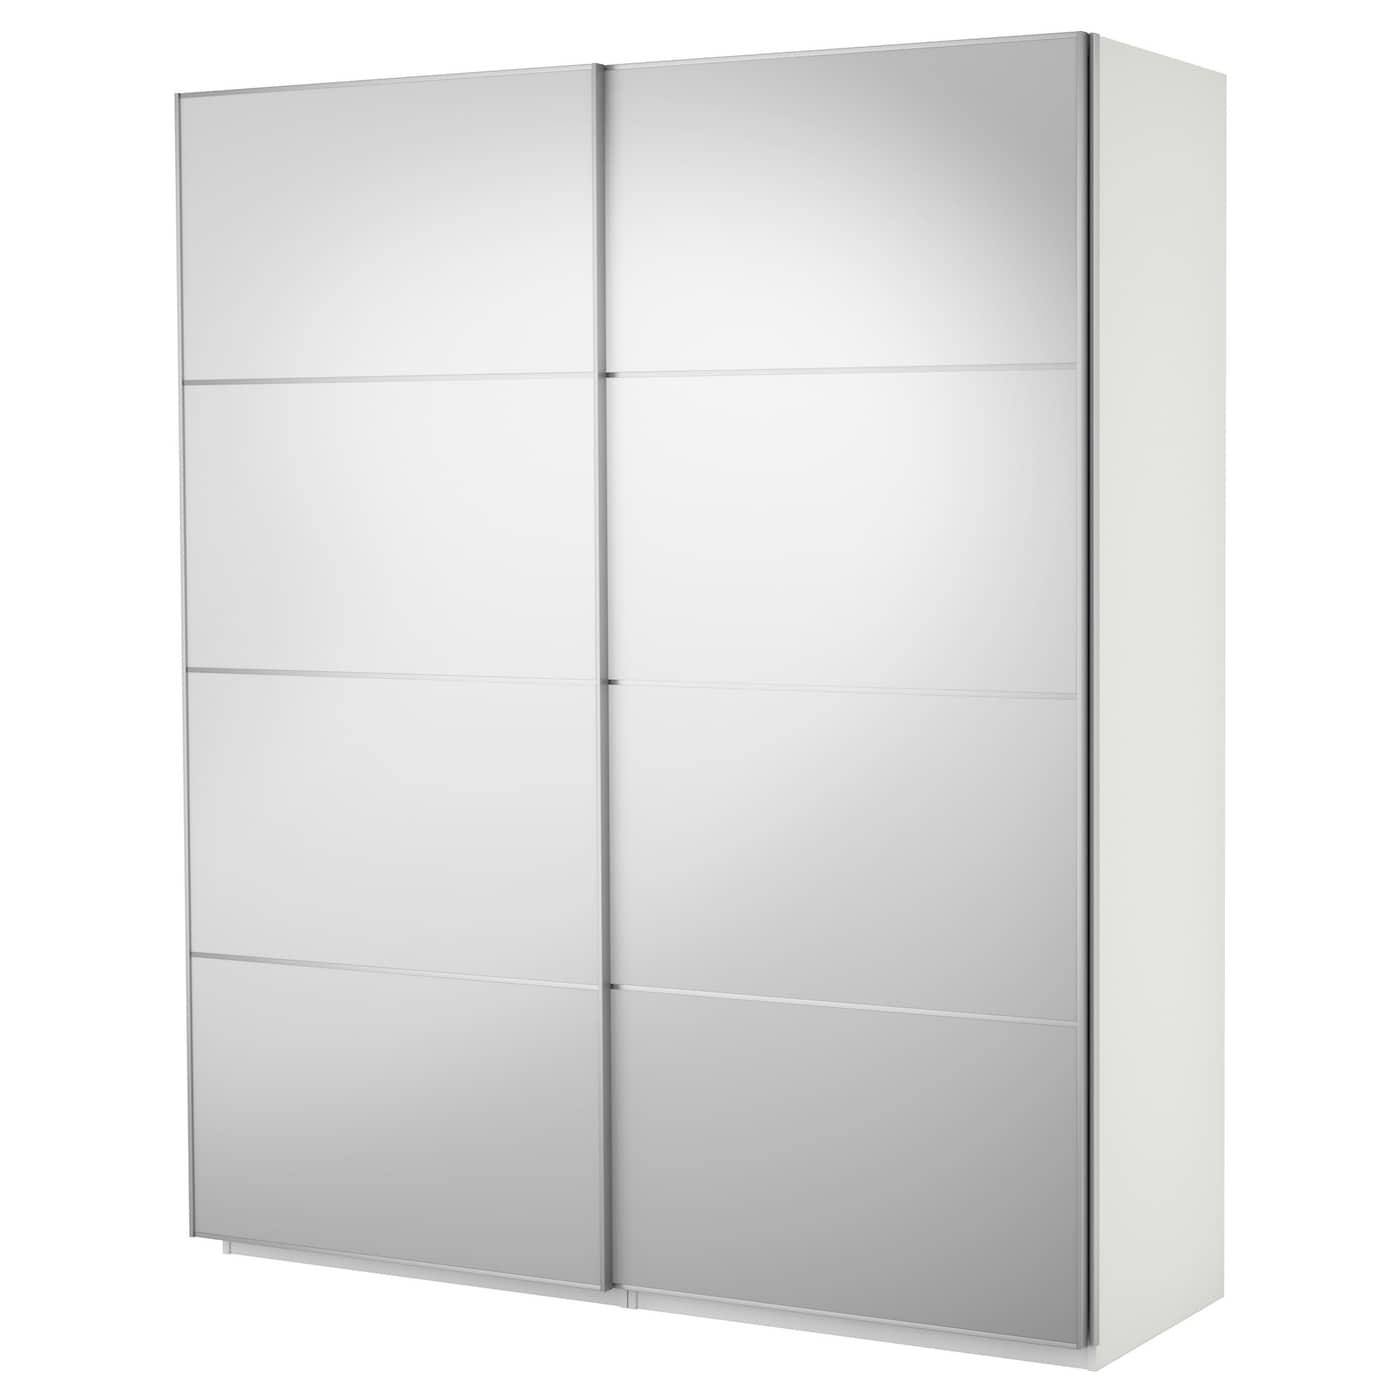 Pax Wardrobe With Sliding Doors Whiteauli Mirror Glass 200 X 44 X